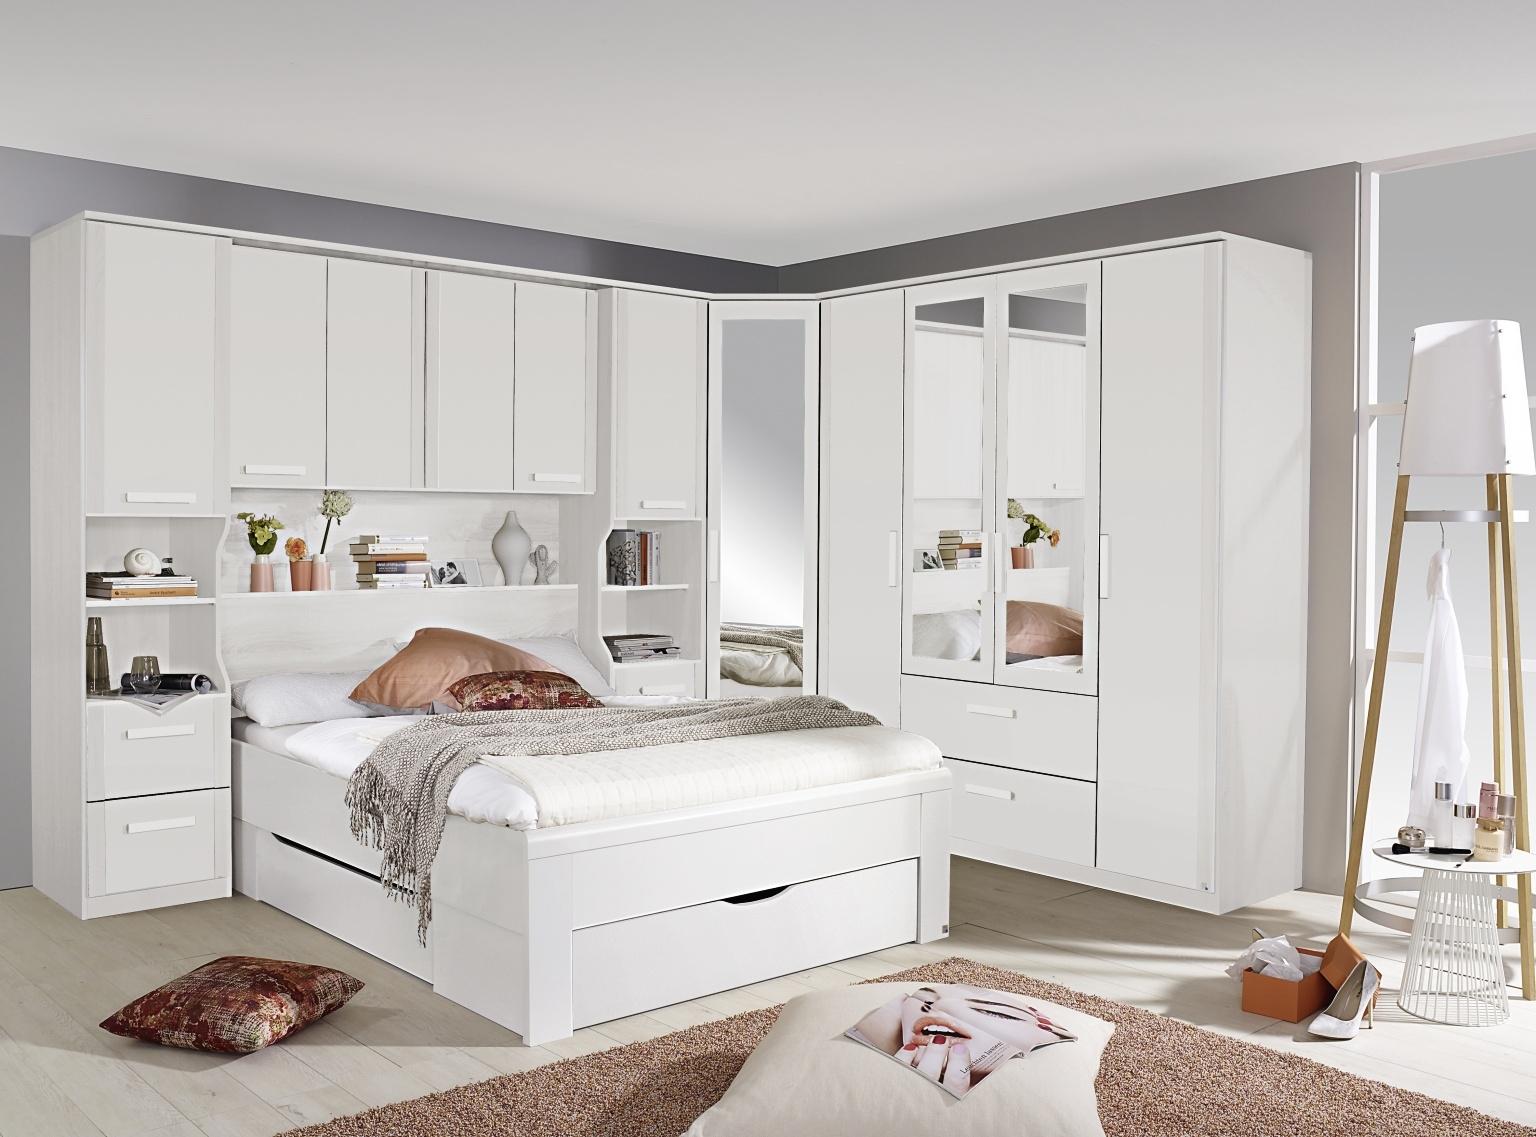 Rauch Rivera Alpine White 4 Door 2 Drawer Combi Wardrobe with Cornice - W 181cm